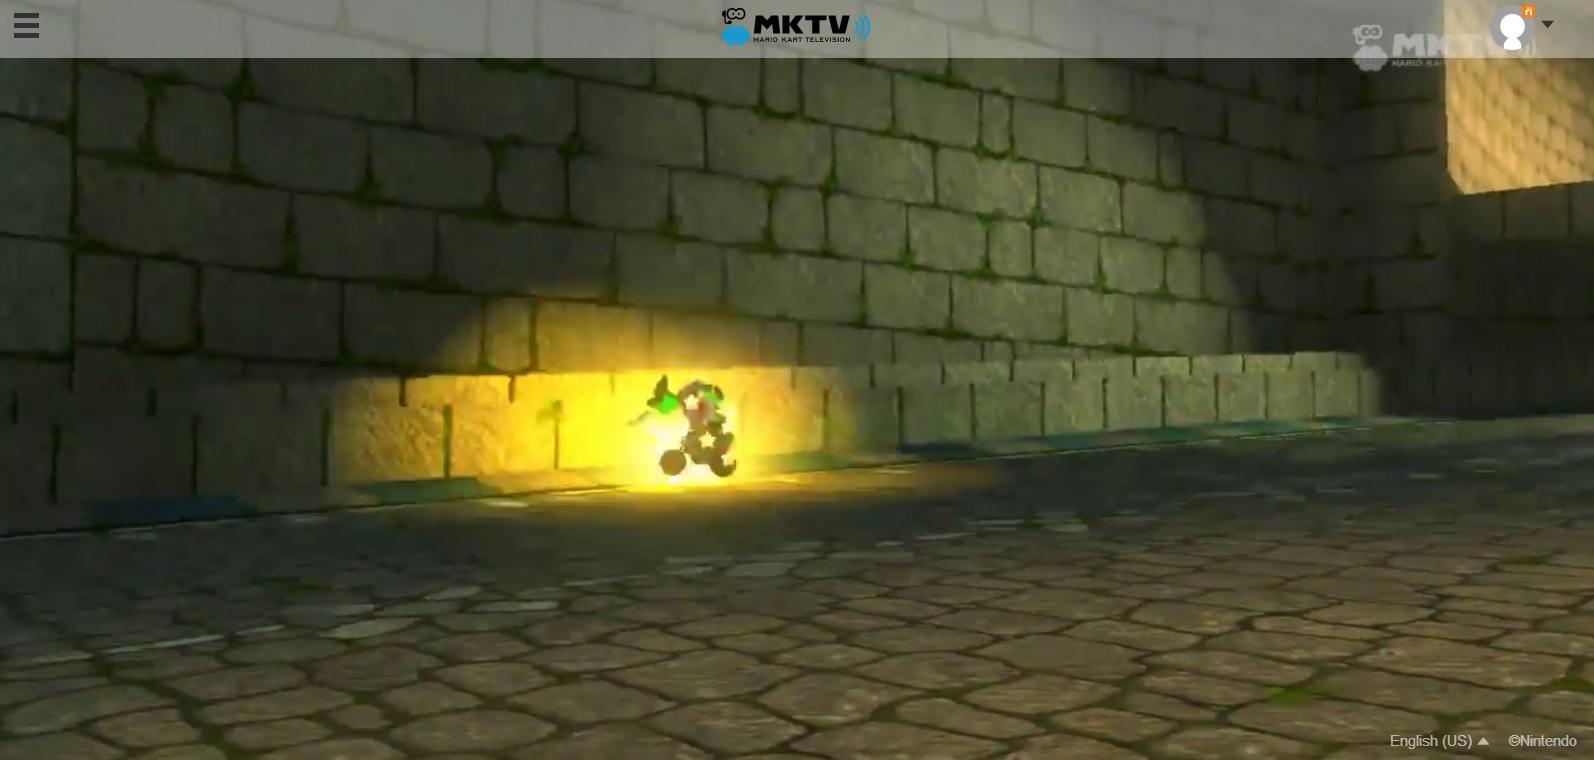 Mario Kart 8 - Mario Kart TV web app now live - Nintendo